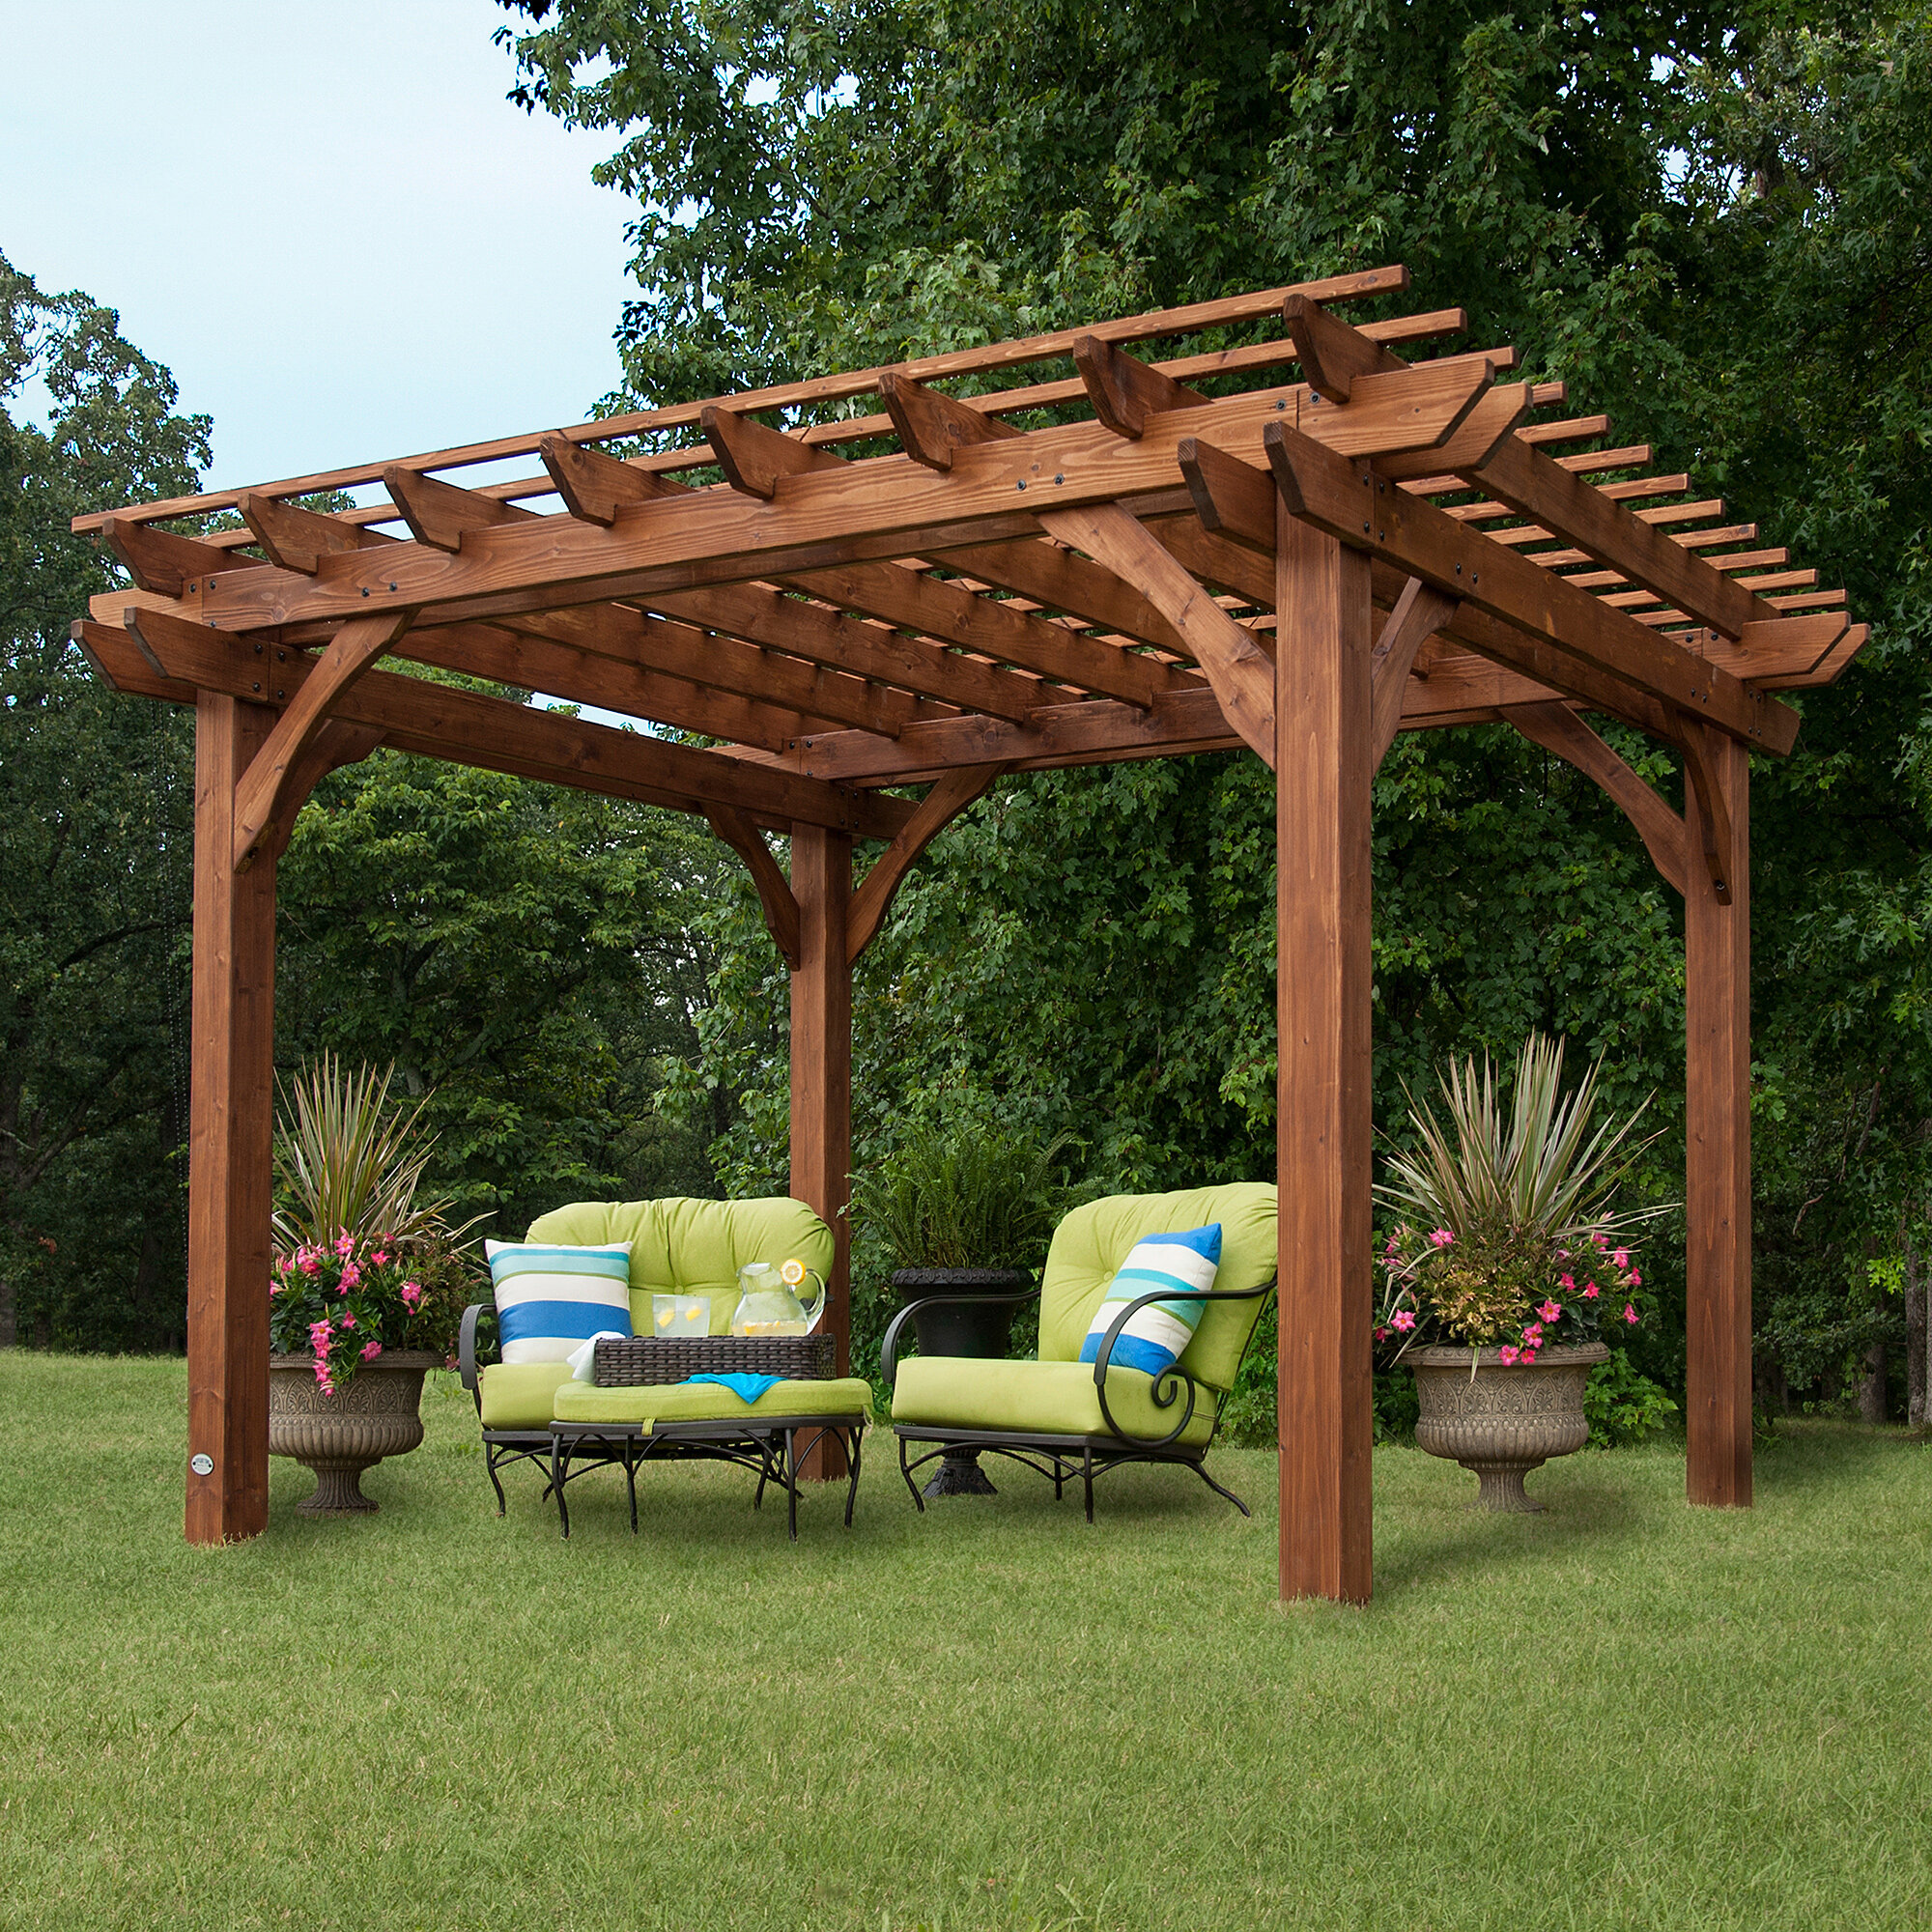 Backyard Discovery Cedar 4 Ft. W x 4 Ft. D Solid Wood Pergola